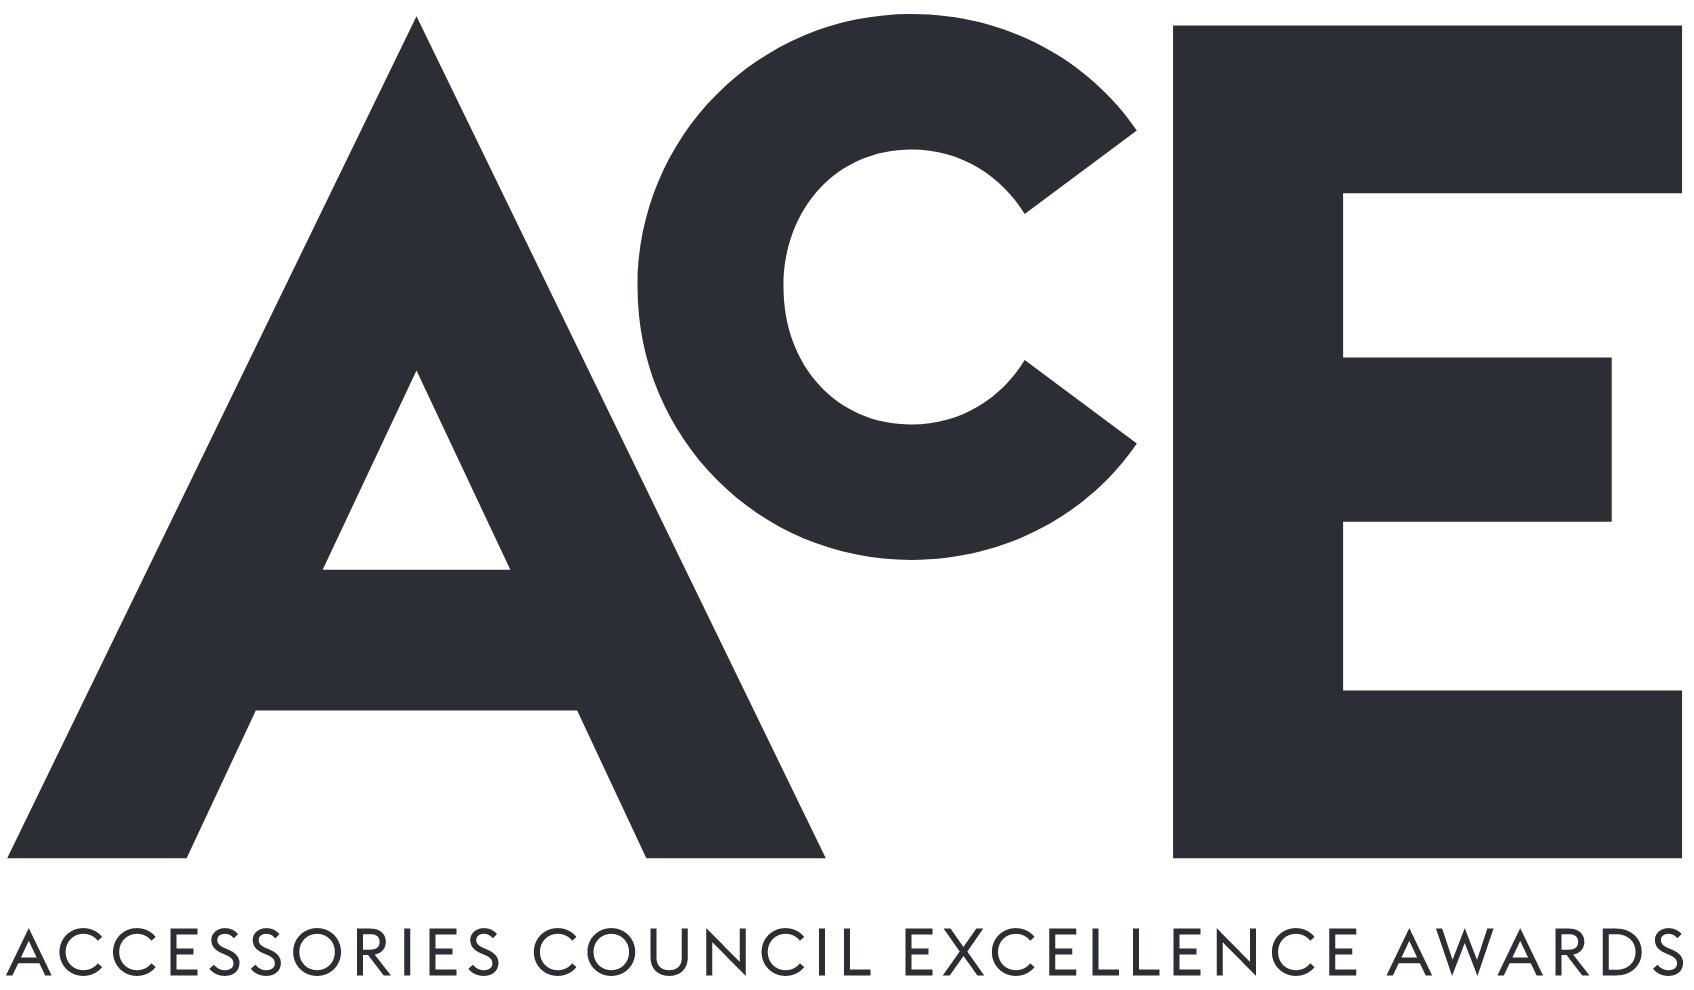 Accessories Council Excellence Awards logo